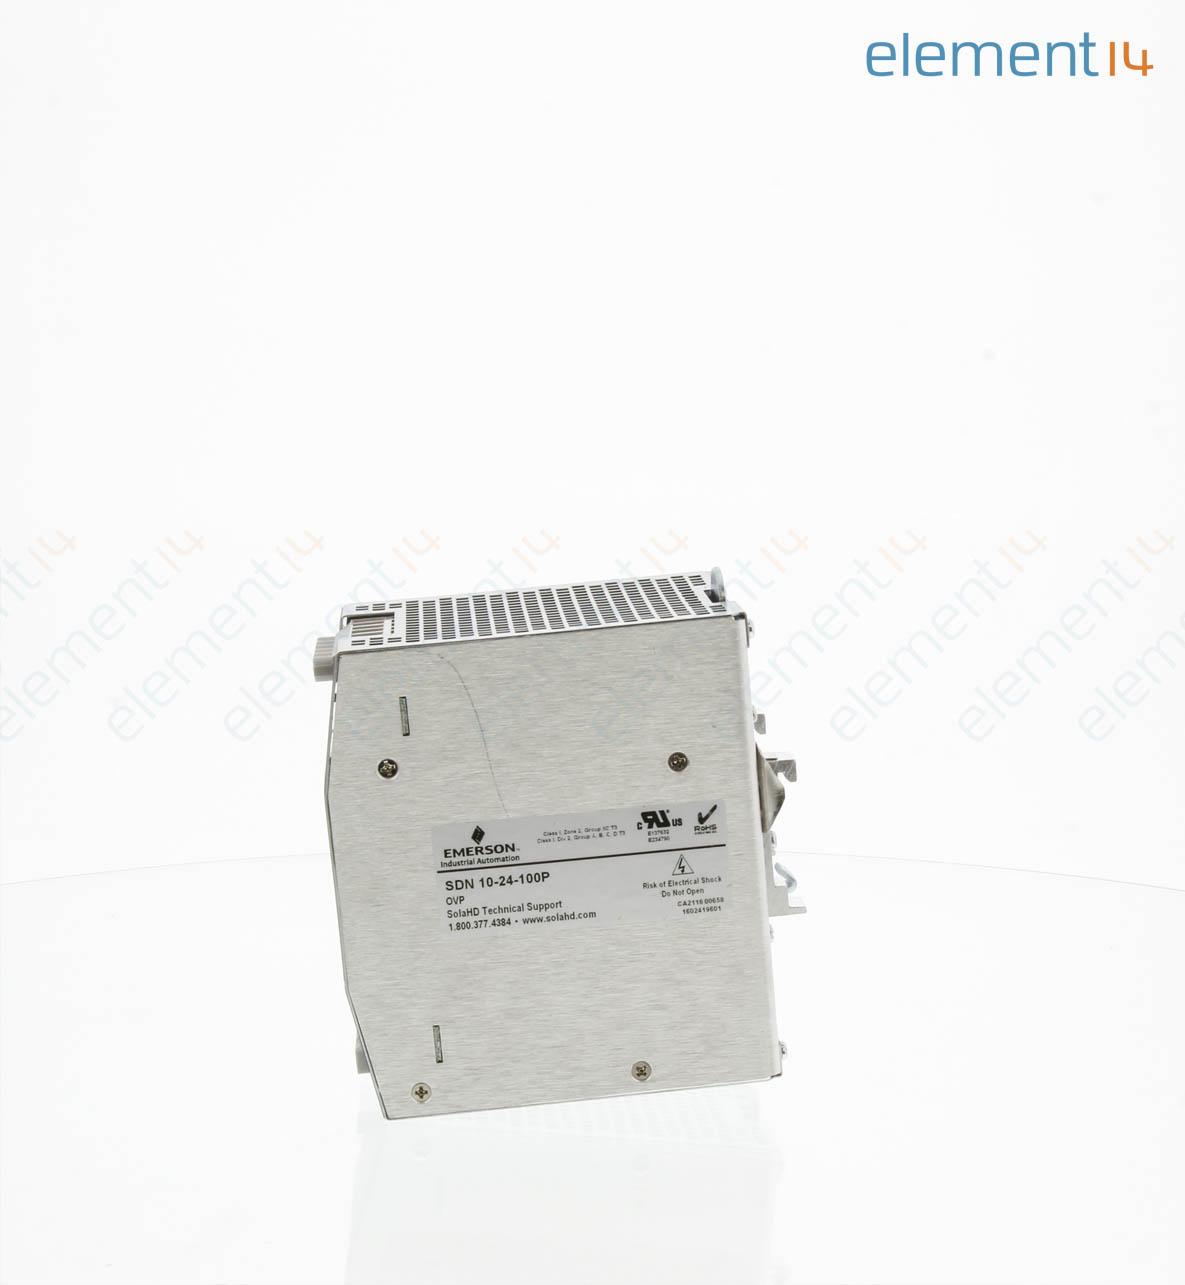 Sdn10 24 100p Solahd Ac Dc Din Rail Power Supply Psu Ite 1 To 4 Demultiplexer Logic Diagram Add Compare